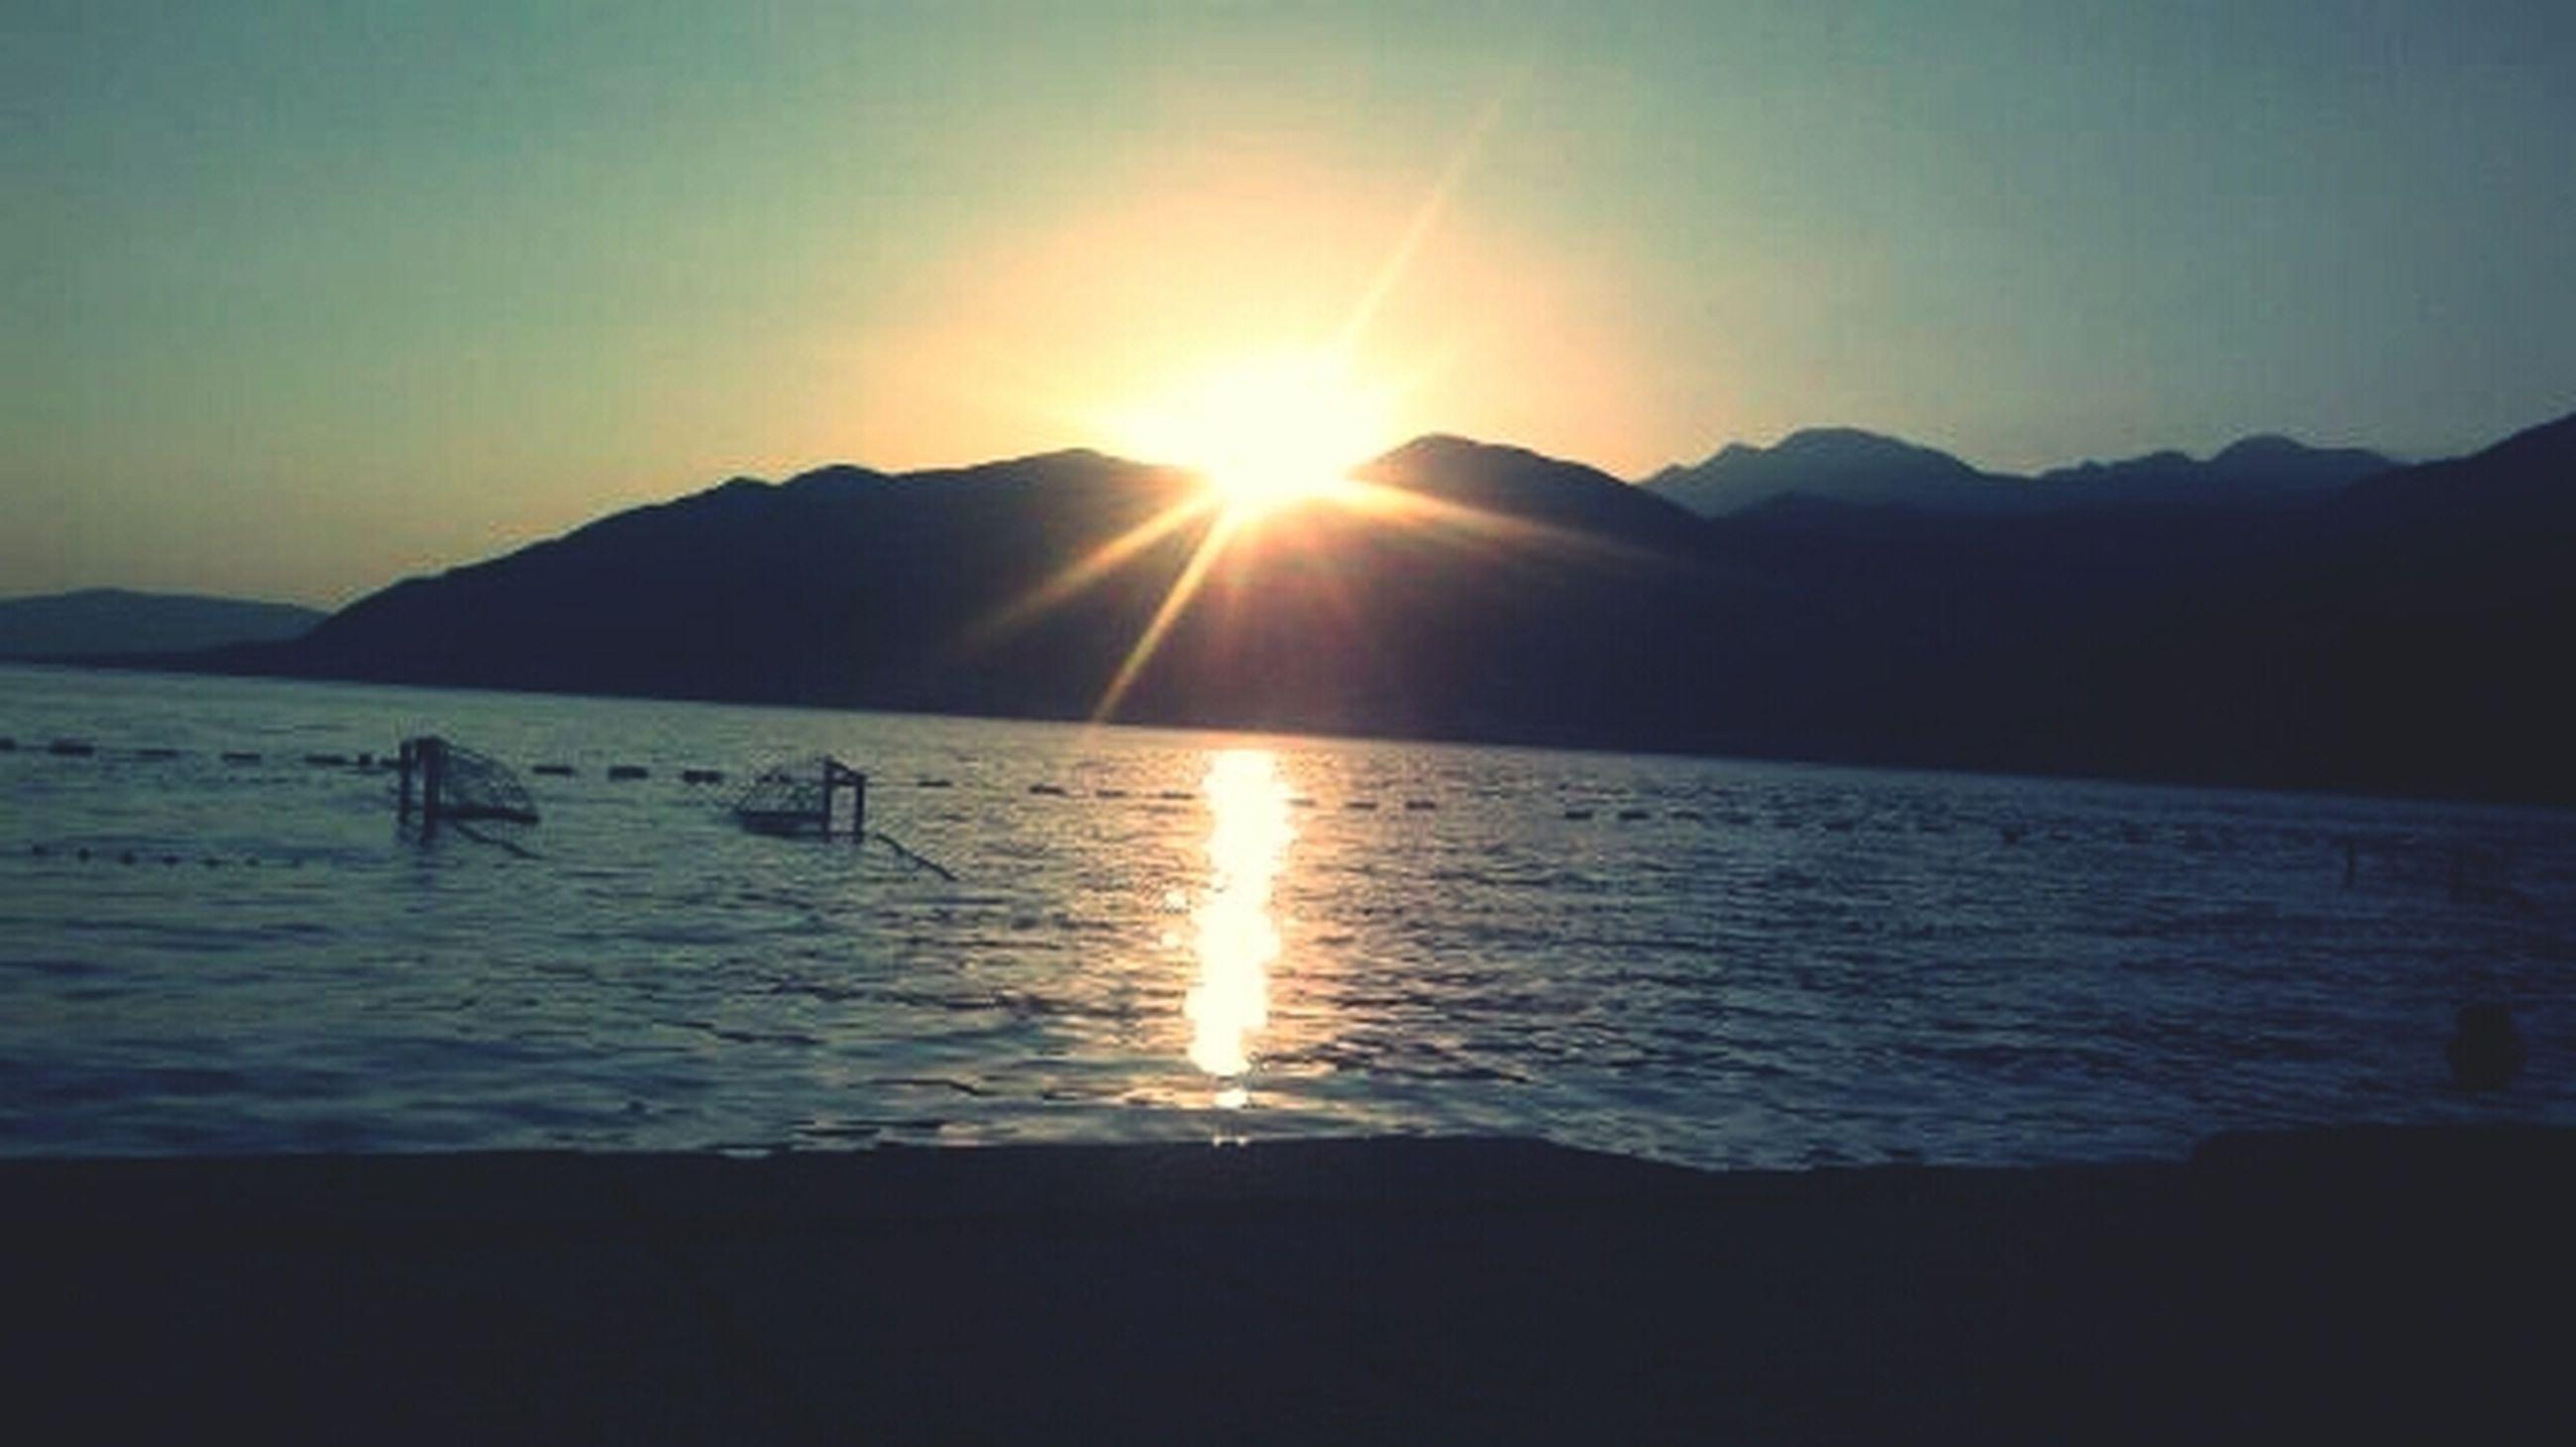 water, sun, mountain, scenics, tranquil scene, sunset, sea, tranquility, beauty in nature, sunlight, reflection, silhouette, sunbeam, mountain range, nature, lens flare, idyllic, sky, clear sky, lake